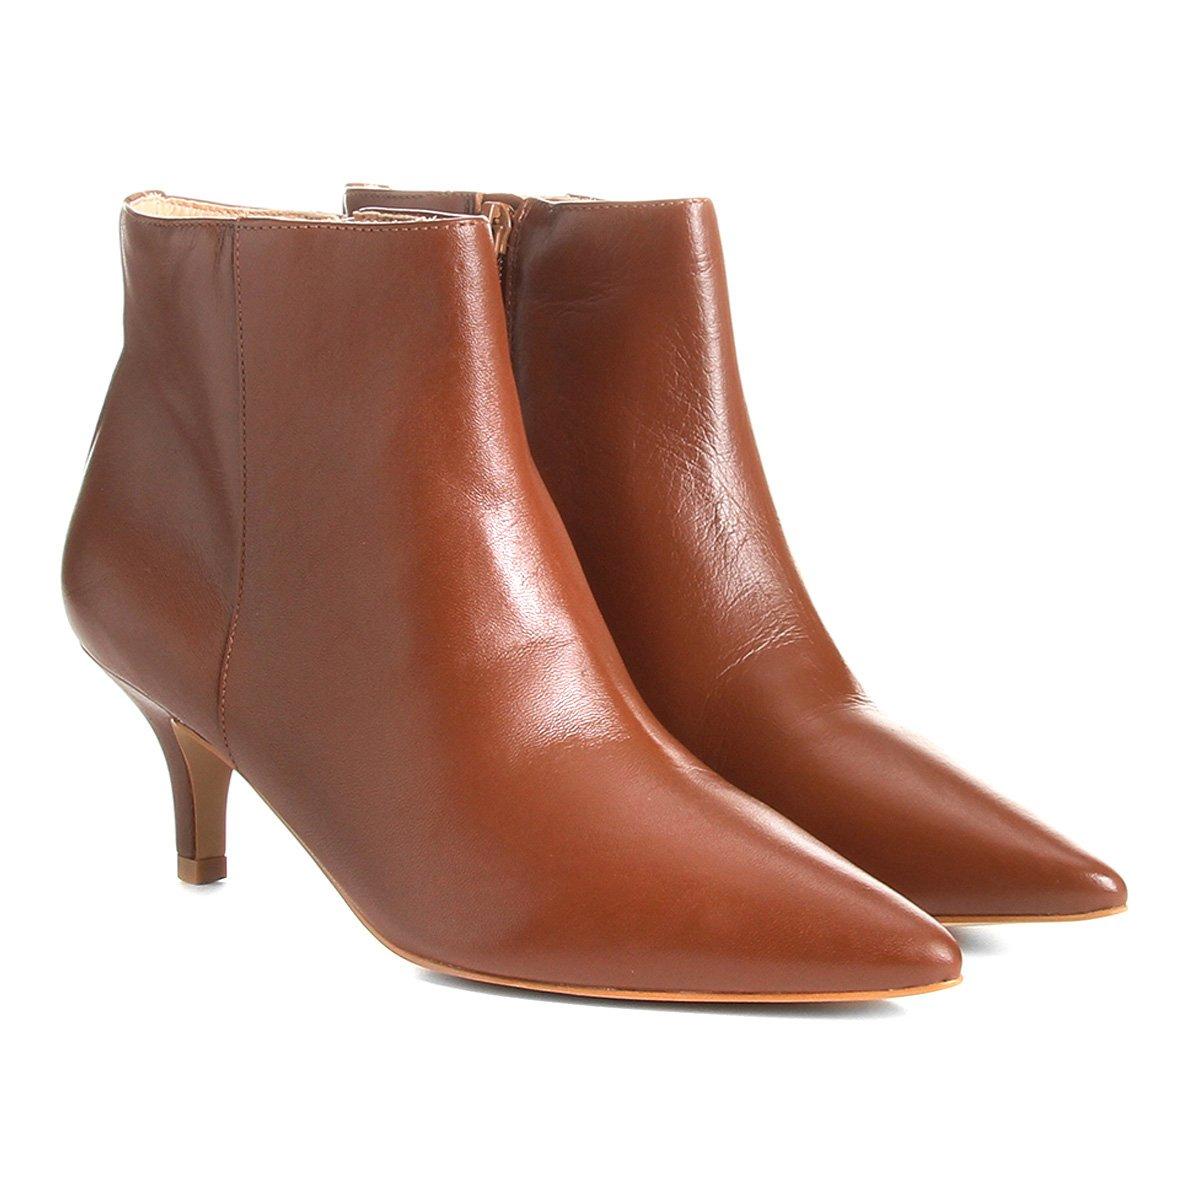 07ebcbb57f Bota Couro Cano Curto Shoestock Salto Curto Feminina - Compre Agora ...